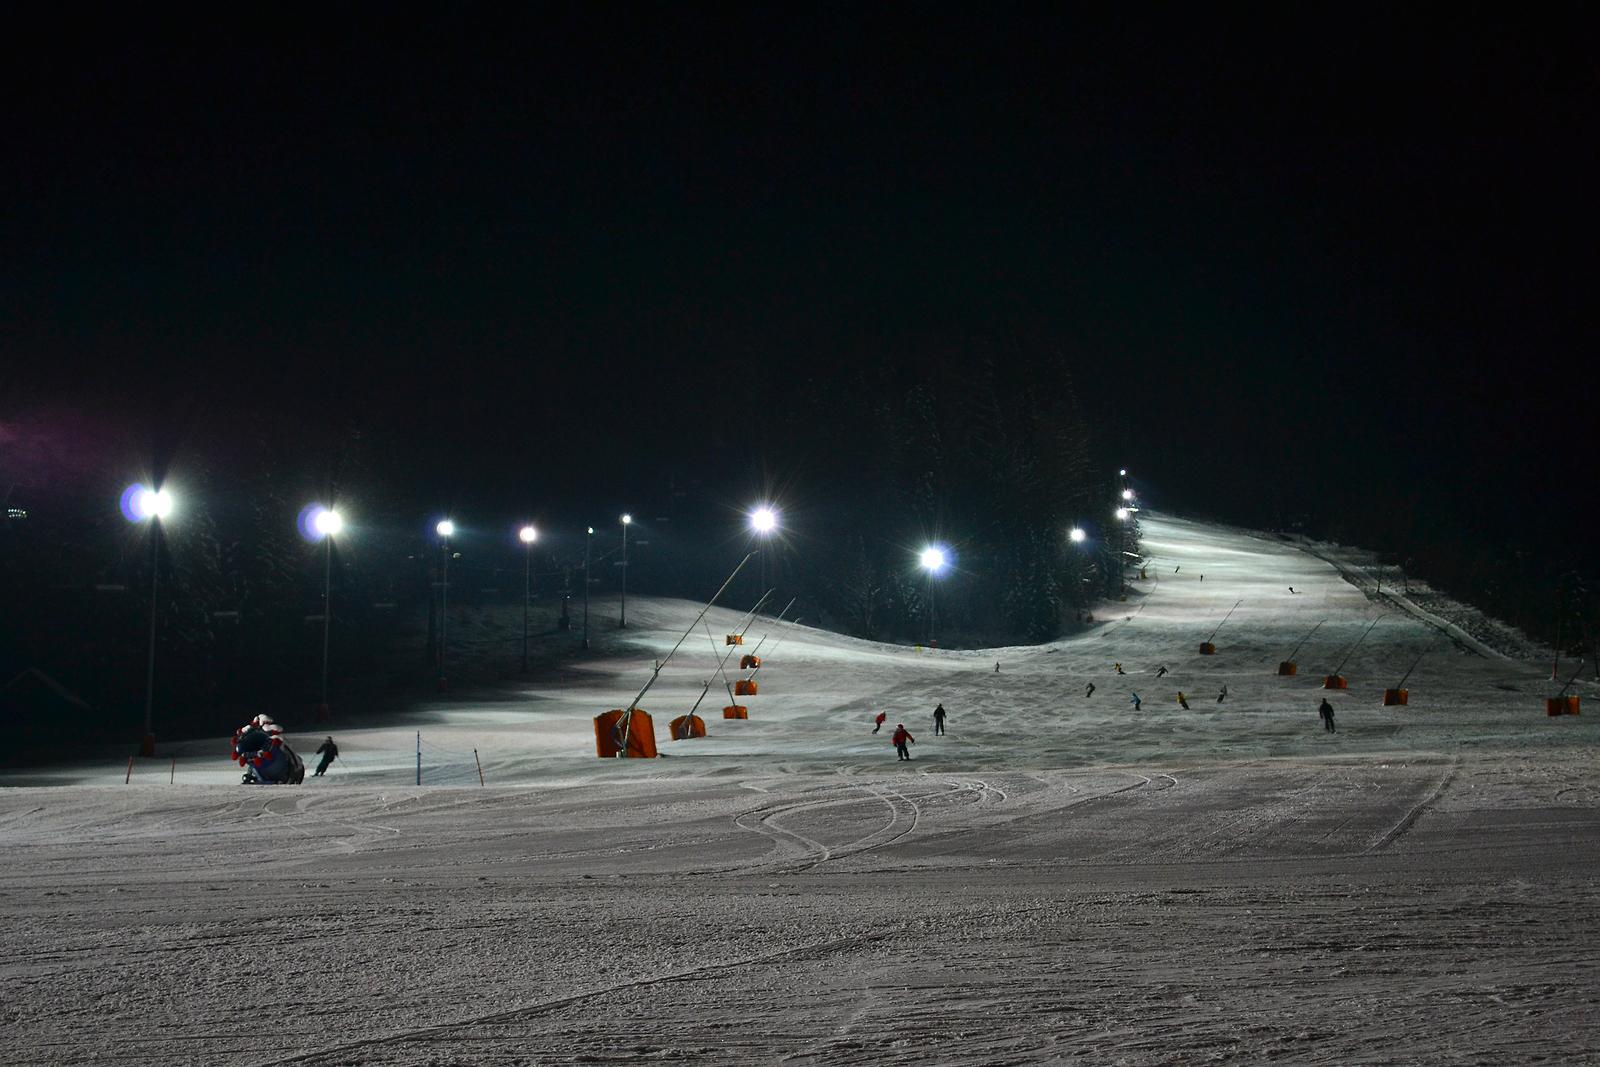 Esquí nocturno en Kranjska Gora; foto: Kranjska Gora Tourist Board; vir: www.slovenia.info